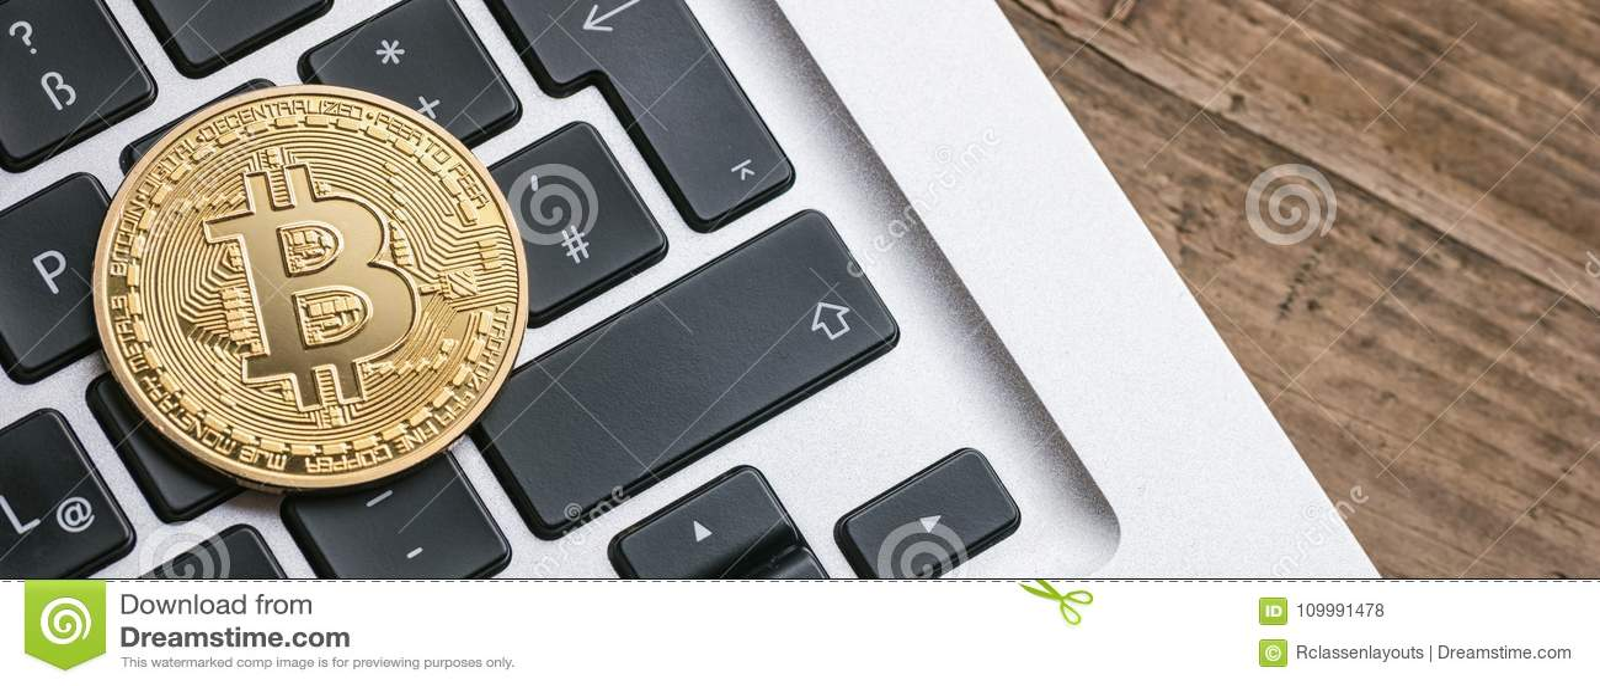 Cryptocurrency Bitcoin de Digital sur un carnet